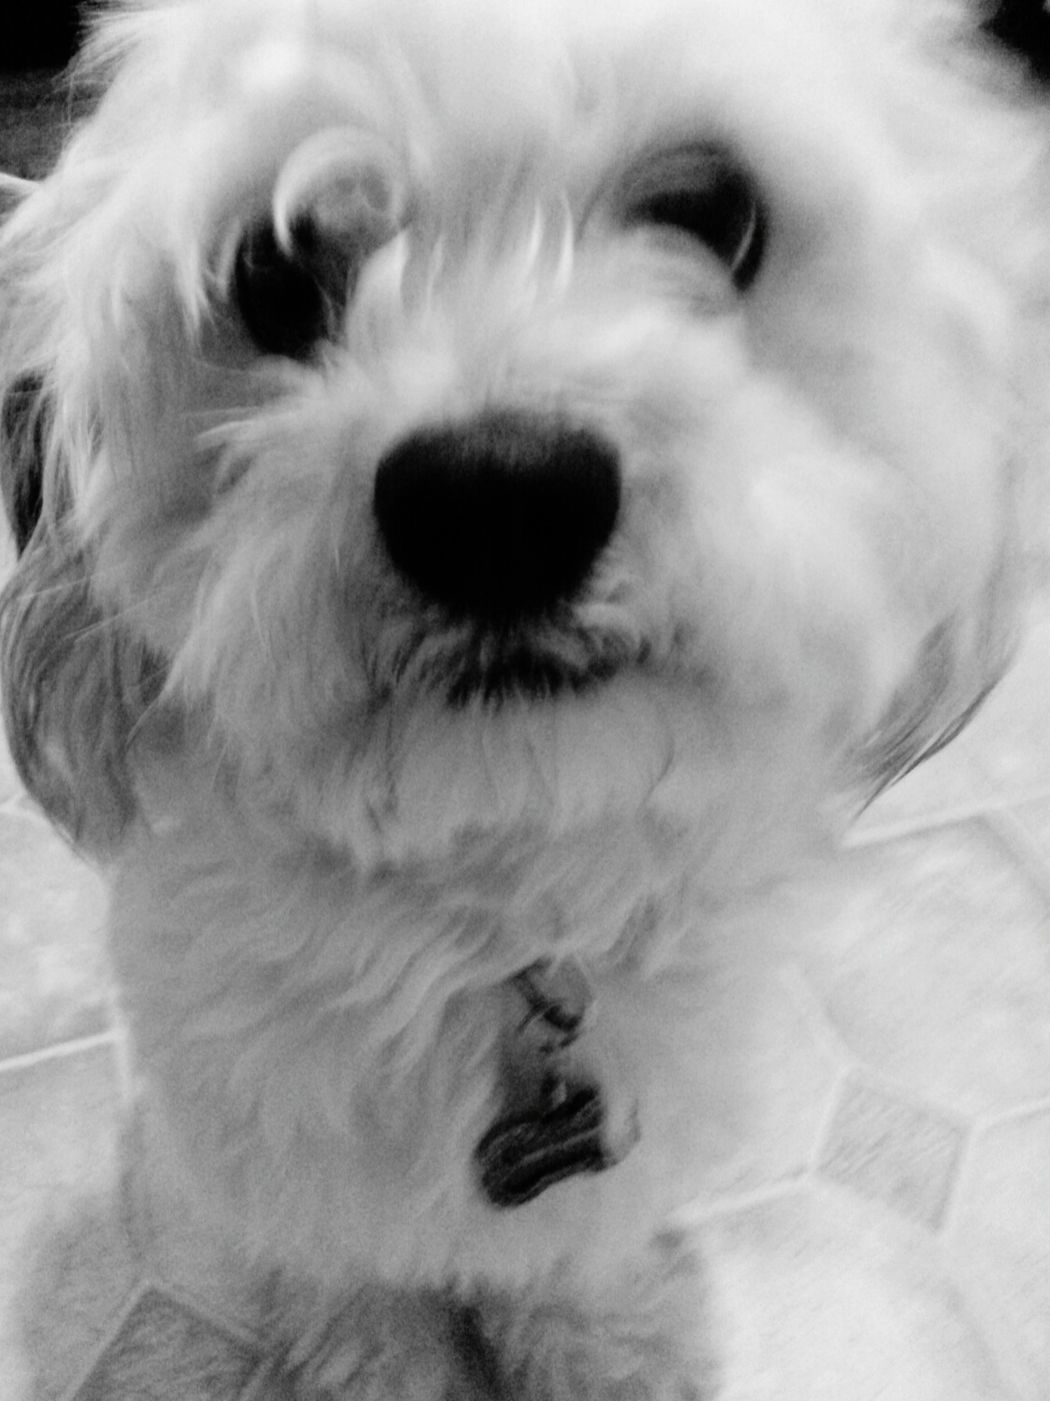 Cute Pets Adorable Dog Breed Teddybear Shitzu Maltese Mix Pet Dog  Teddybear Pet Love Pet Adorable Pet Black And White Photography